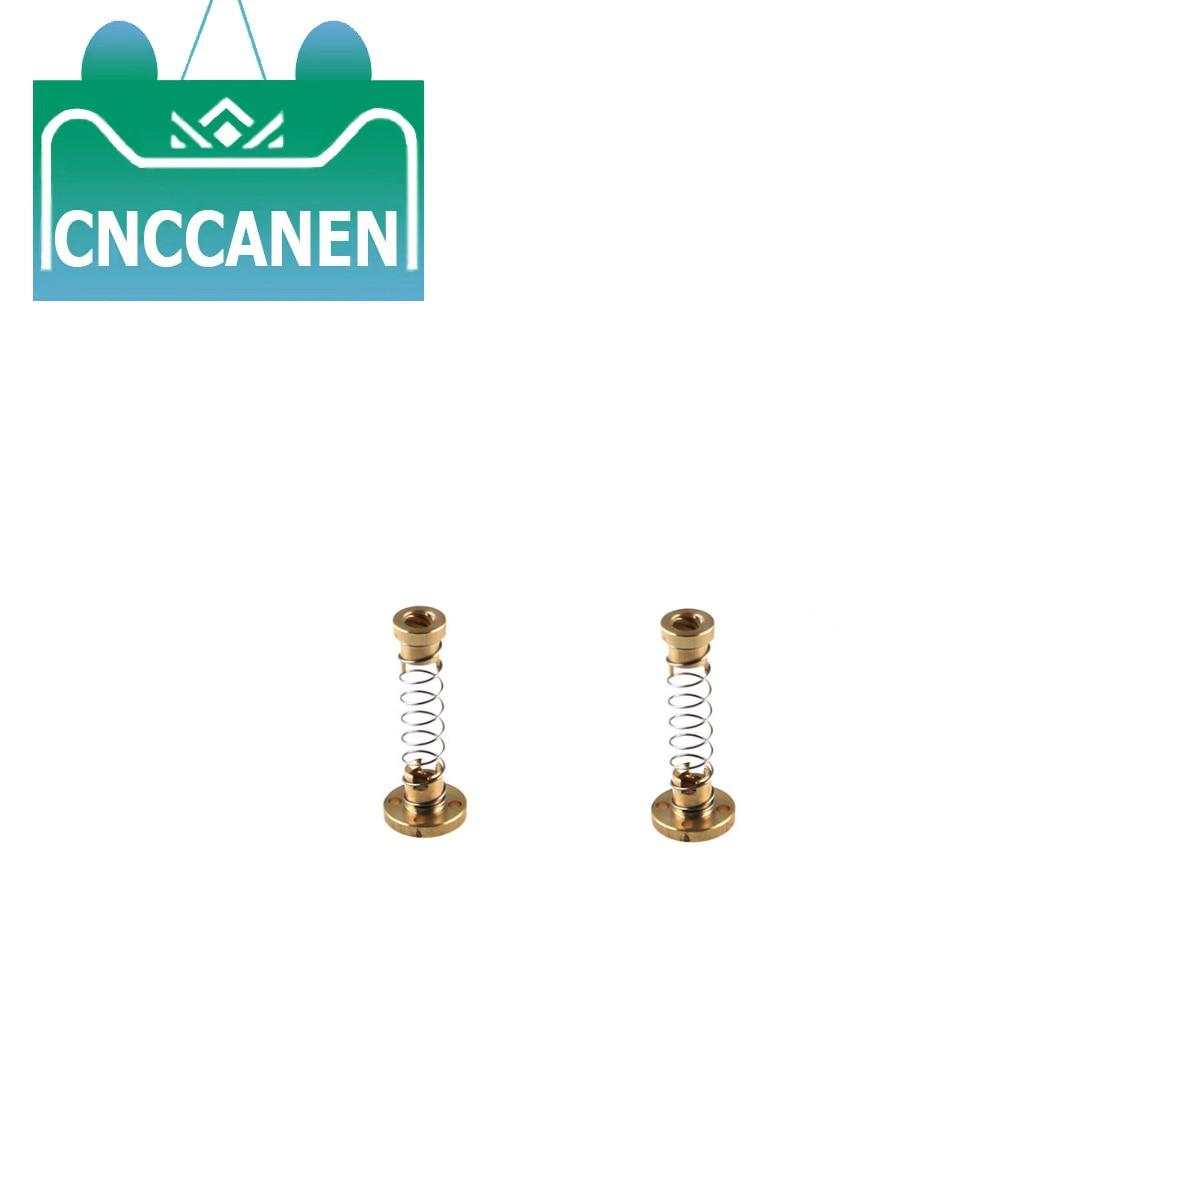 2PCS T8 Spring Loaded Anti Backlash Nut For 8mm Acme Threaded Rod Lead Screws DIY CNC 3D Printer Parts